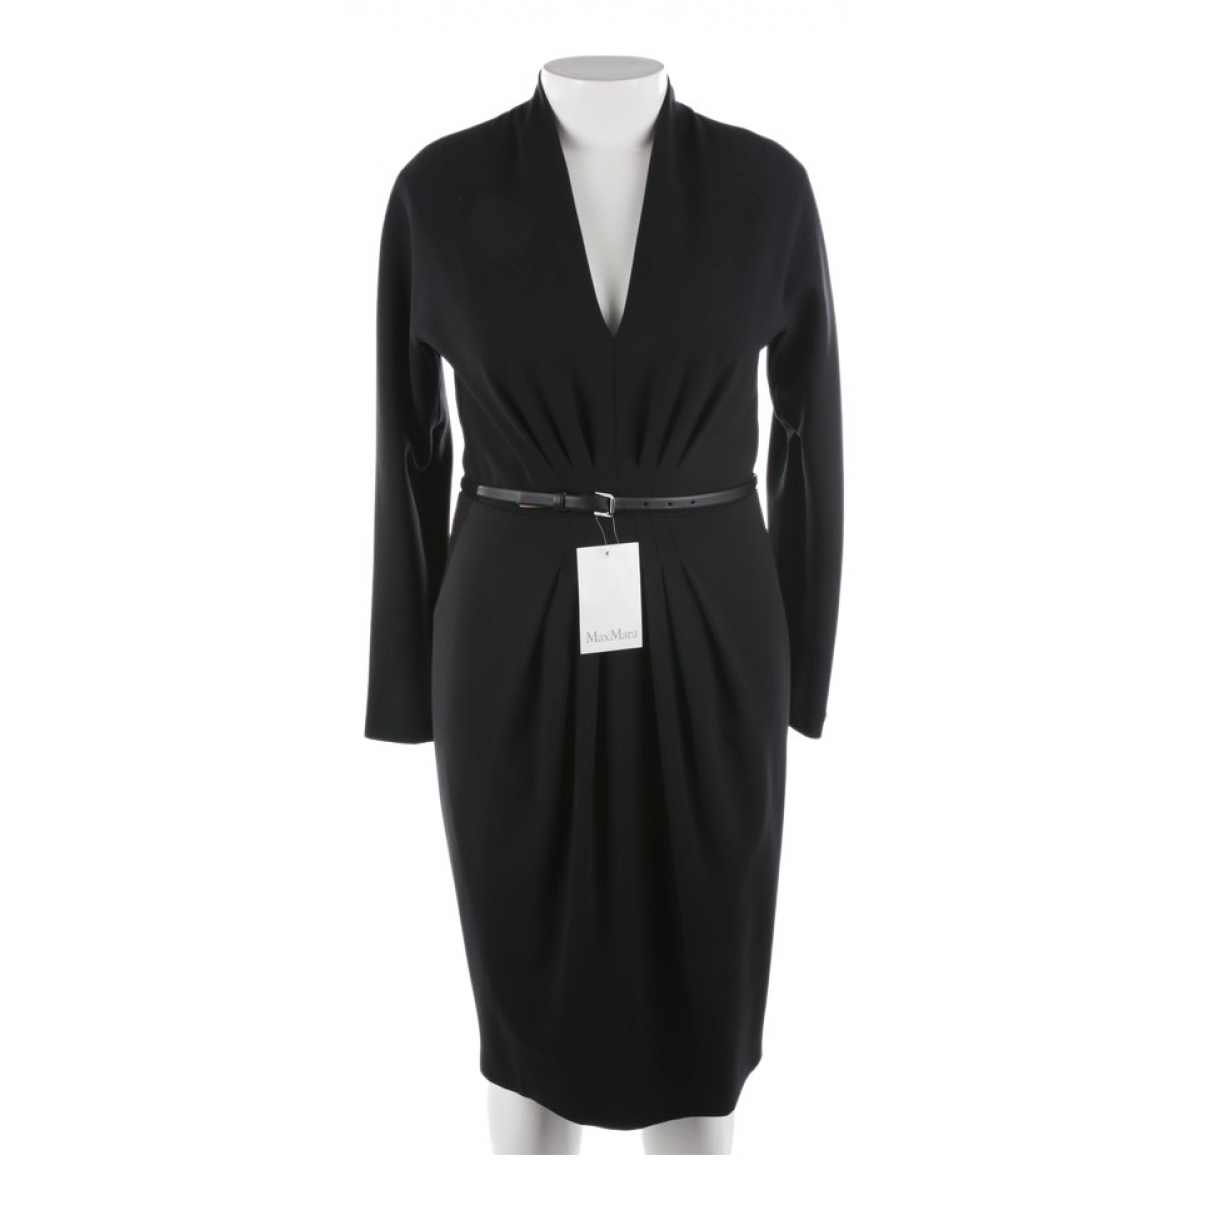 Max Mara \N Black Silk dress for Women 44 FR